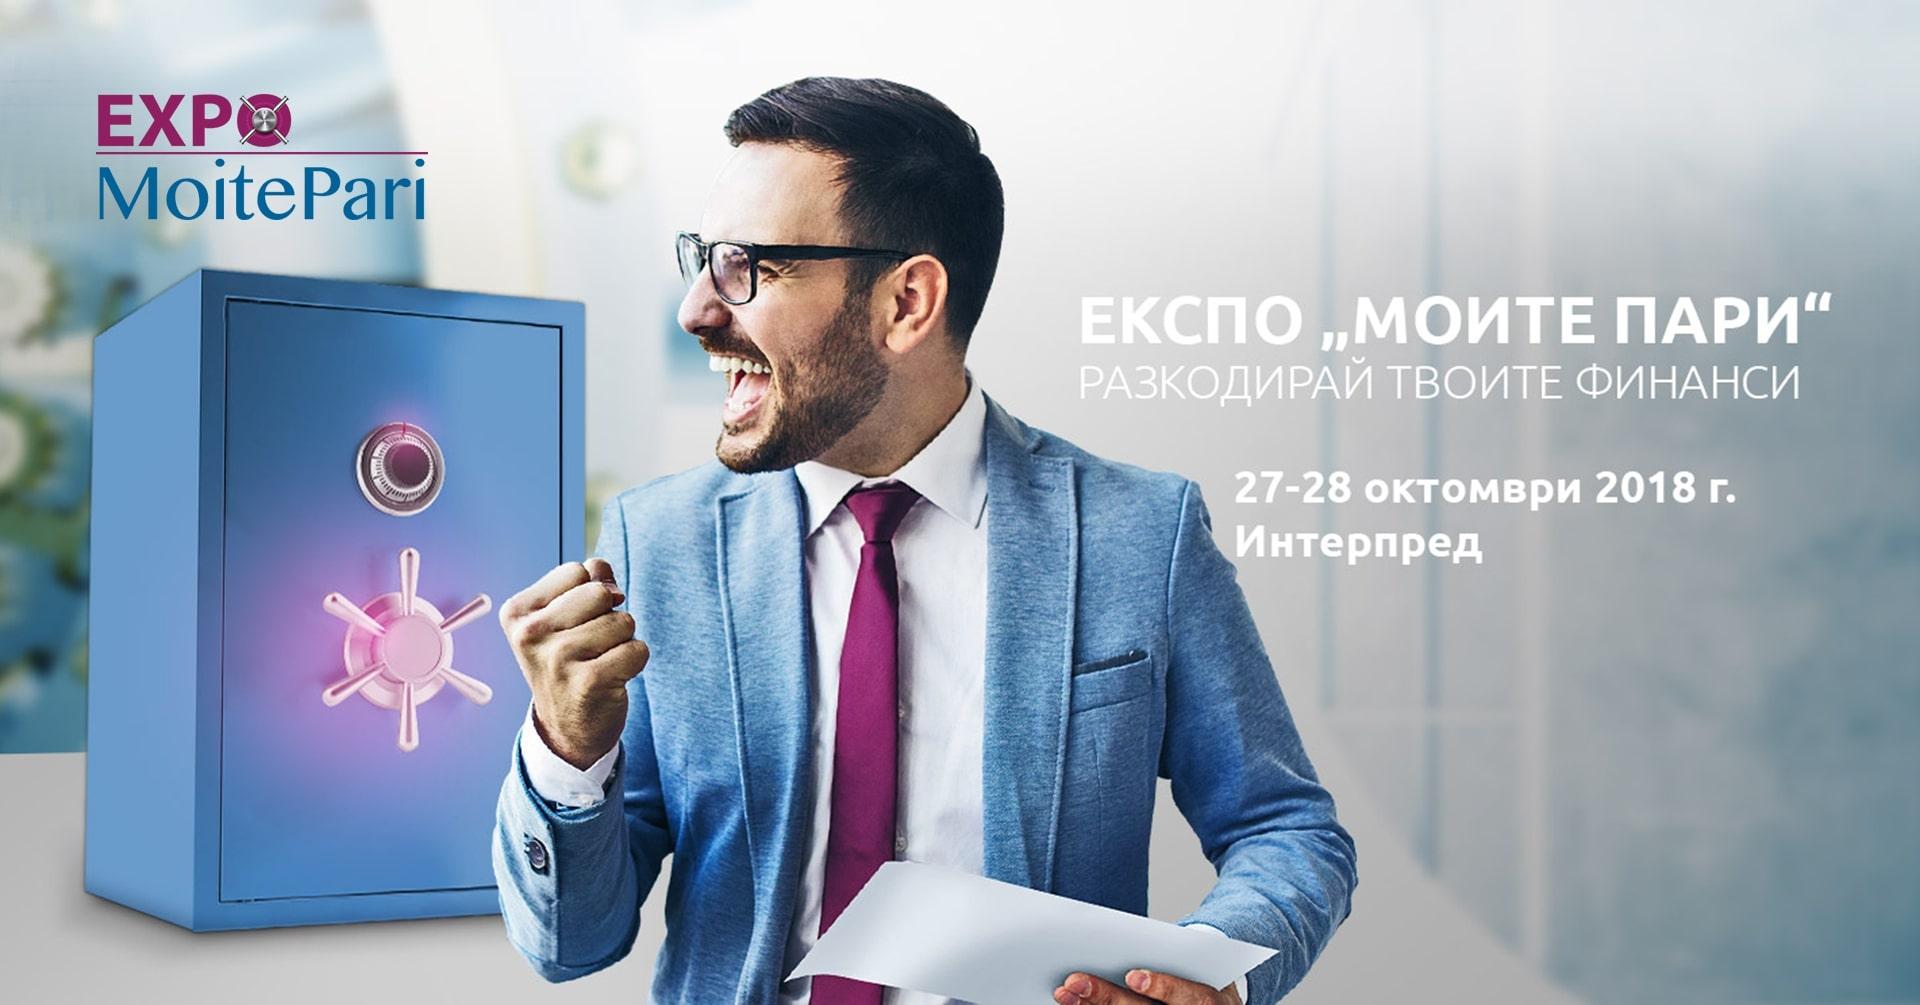 http://3con.eu/newsroom/wp-content/uploads/2018/09/Expo-MoitePari.jpg